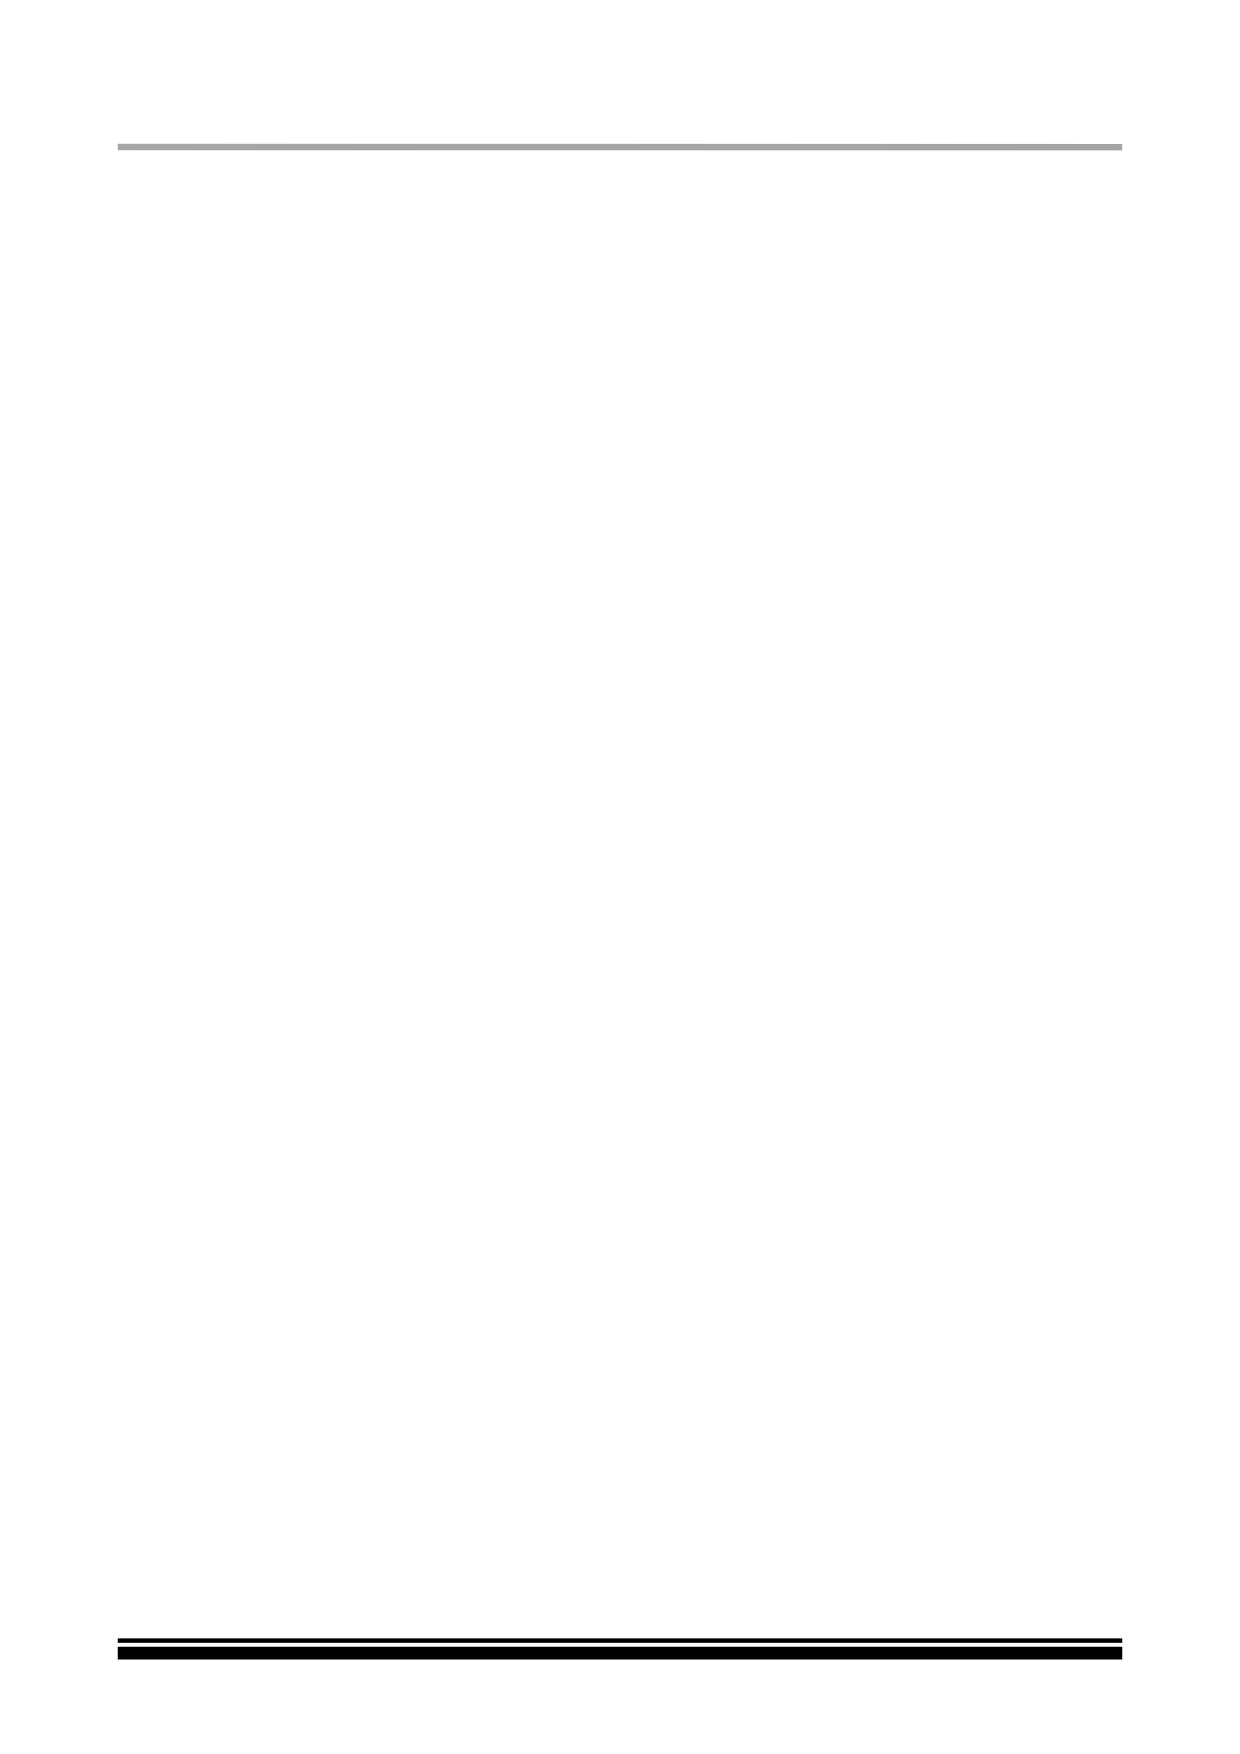 I3507-6HMN3224B Даташит, Описание, Даташиты